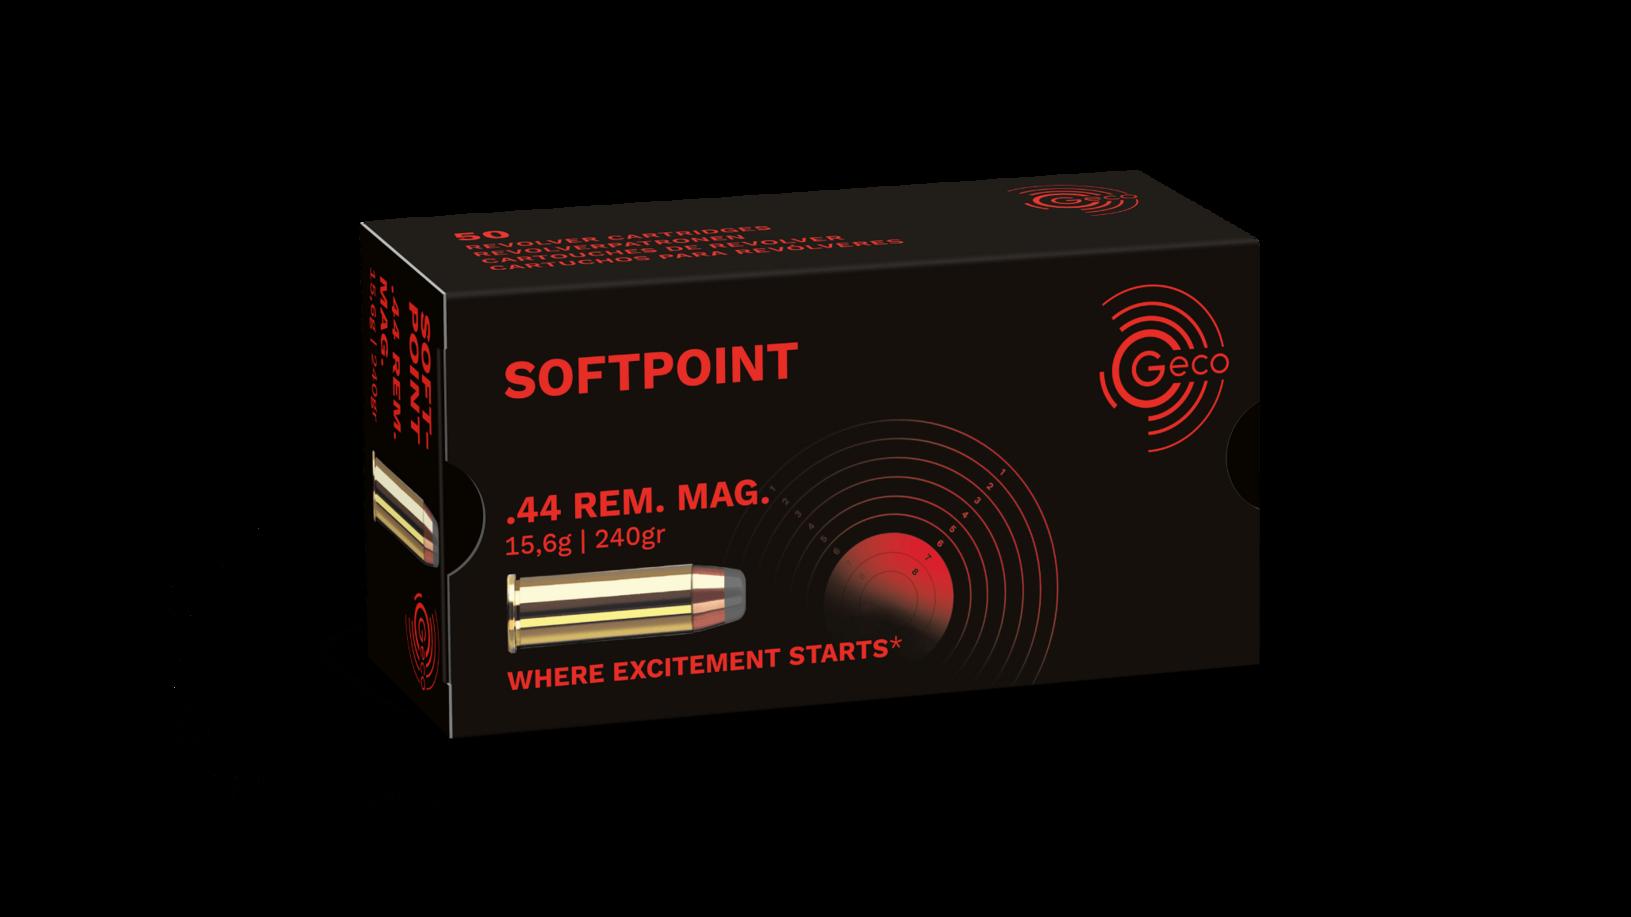 Image of GECO Softpoint